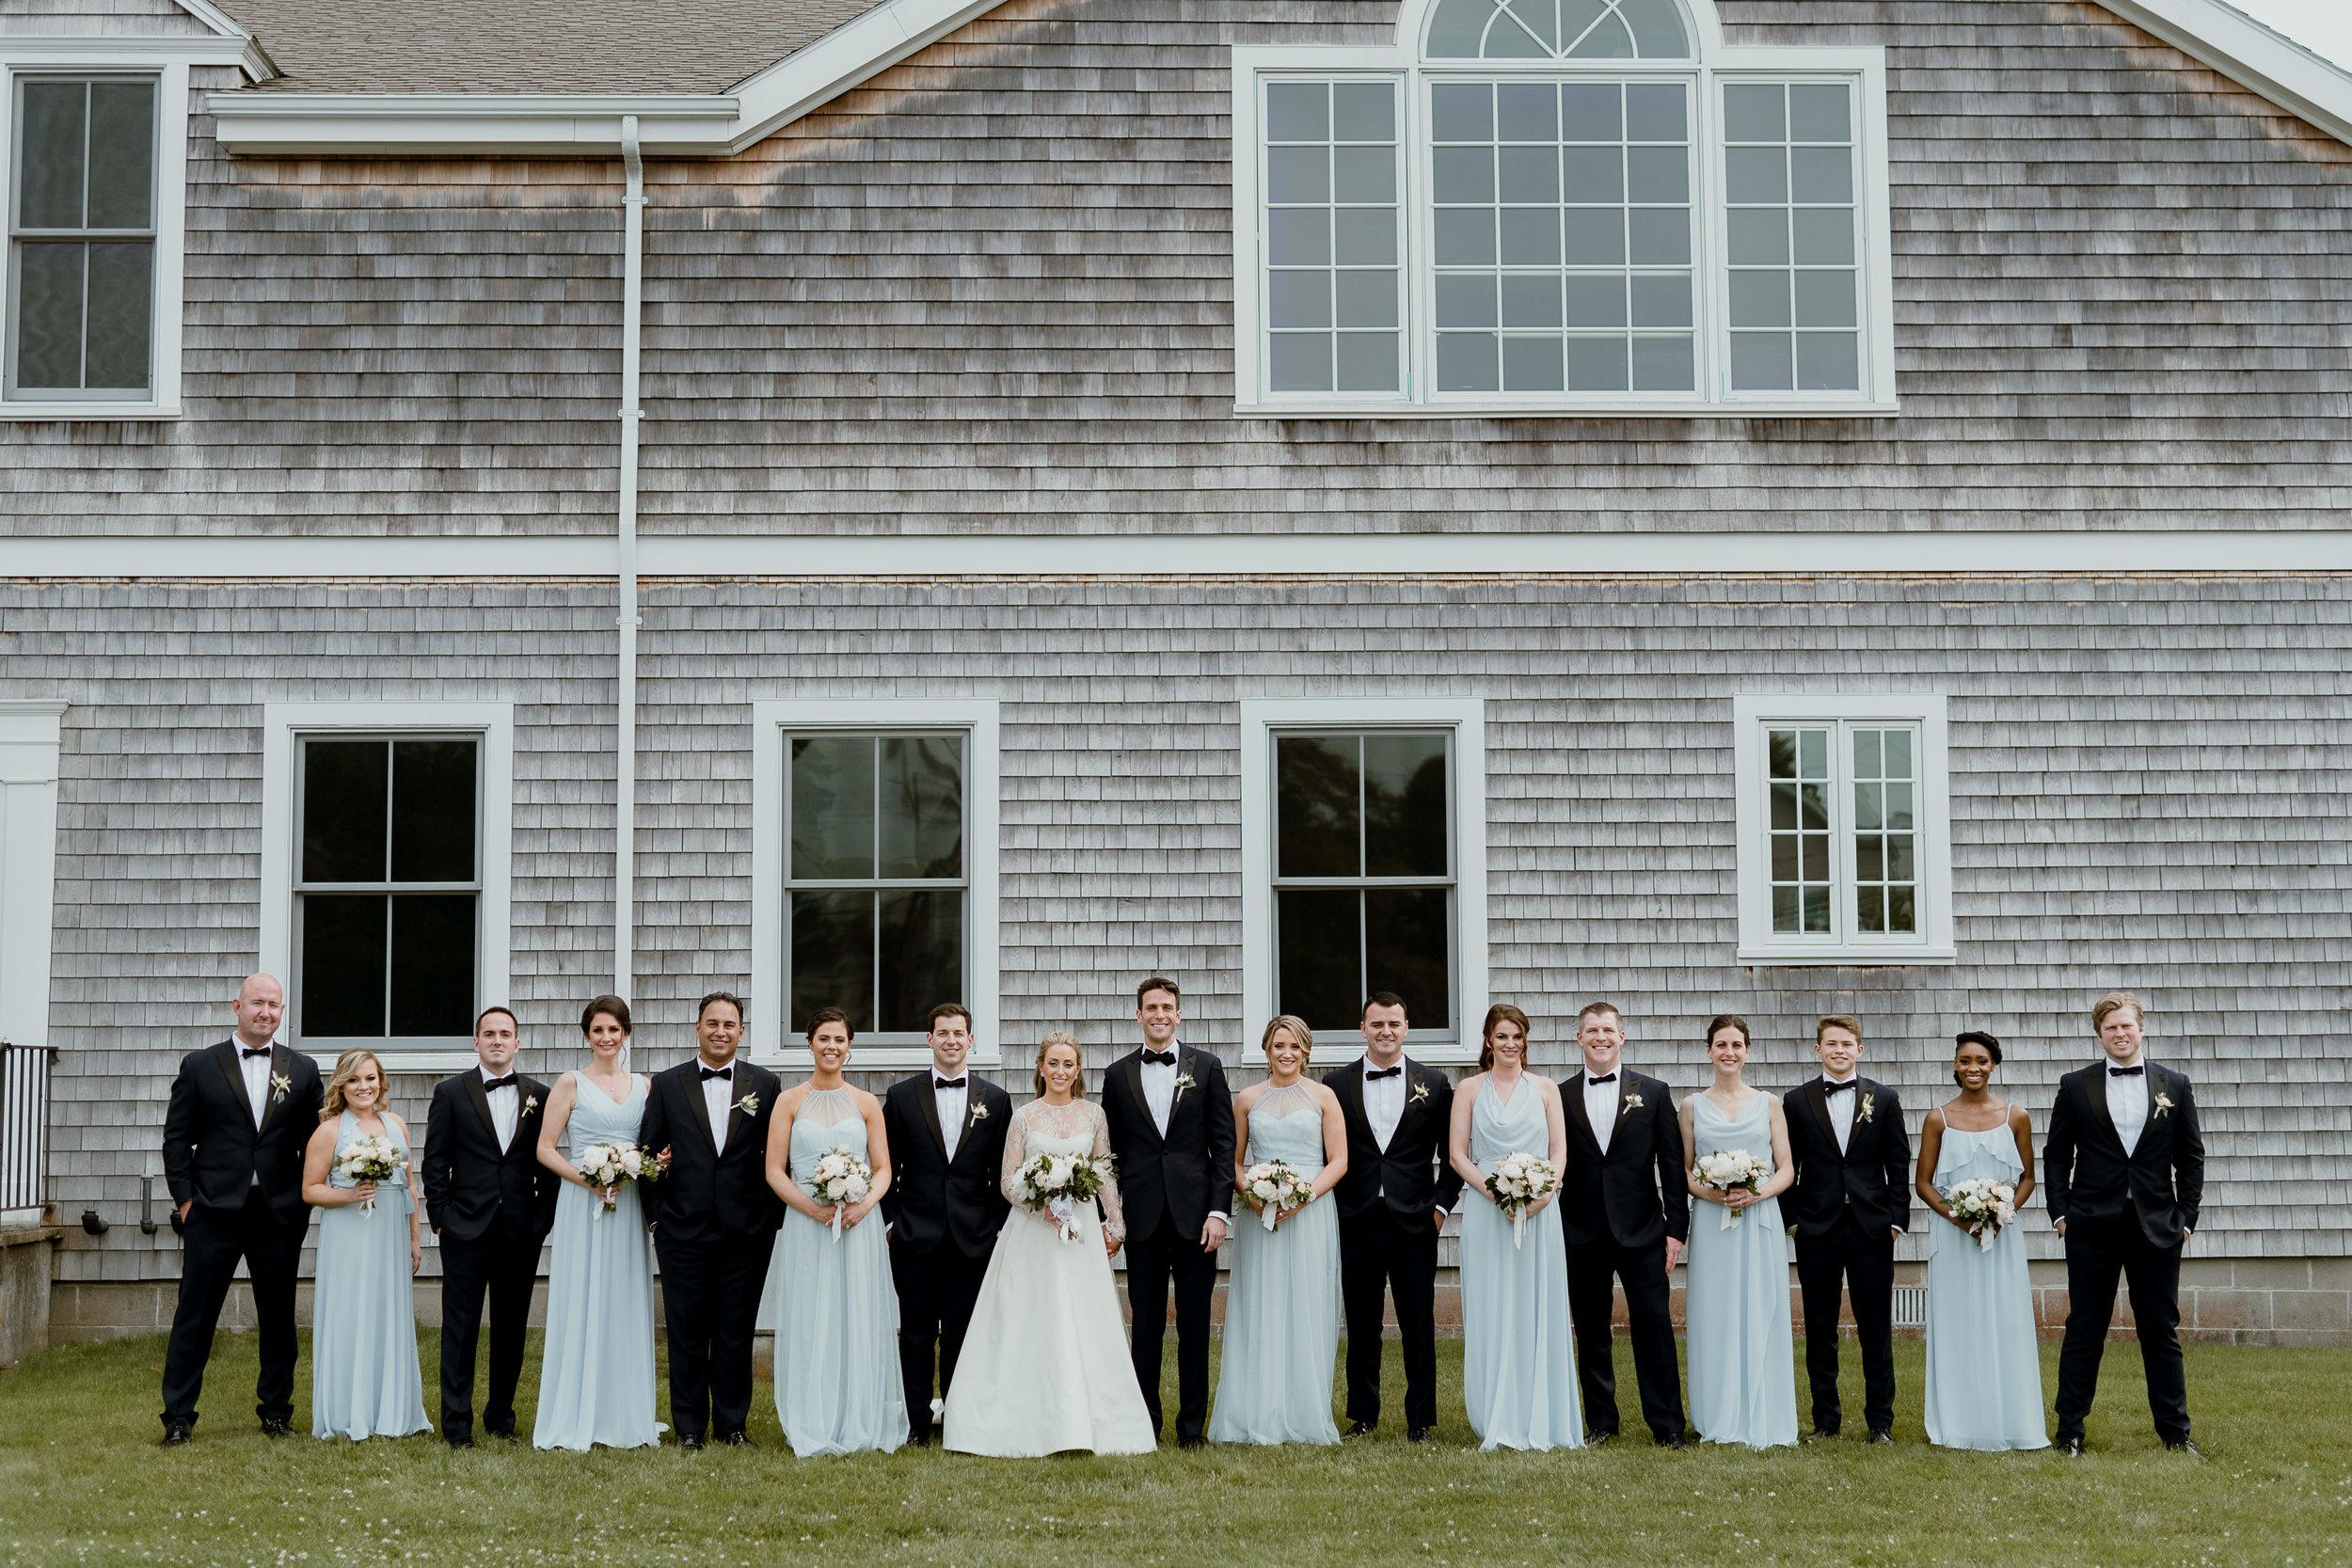 Green & White Wedding Jonathon Edwards Vineyard Wedding0-559.jpg